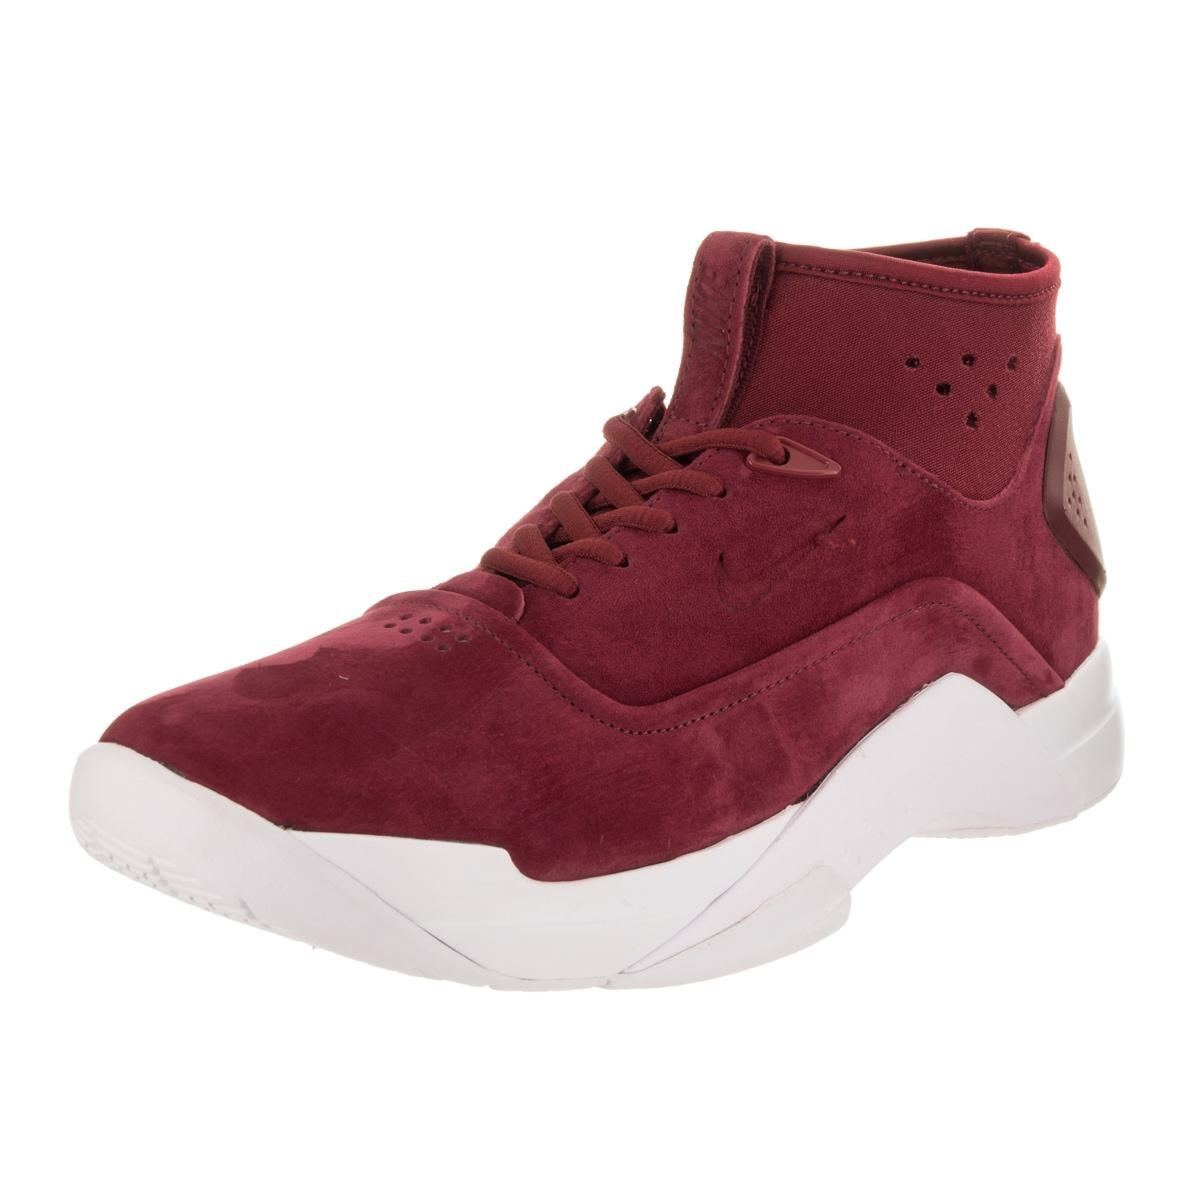 Nike Men's Hyperdunk Red Suede Basketball Shoe